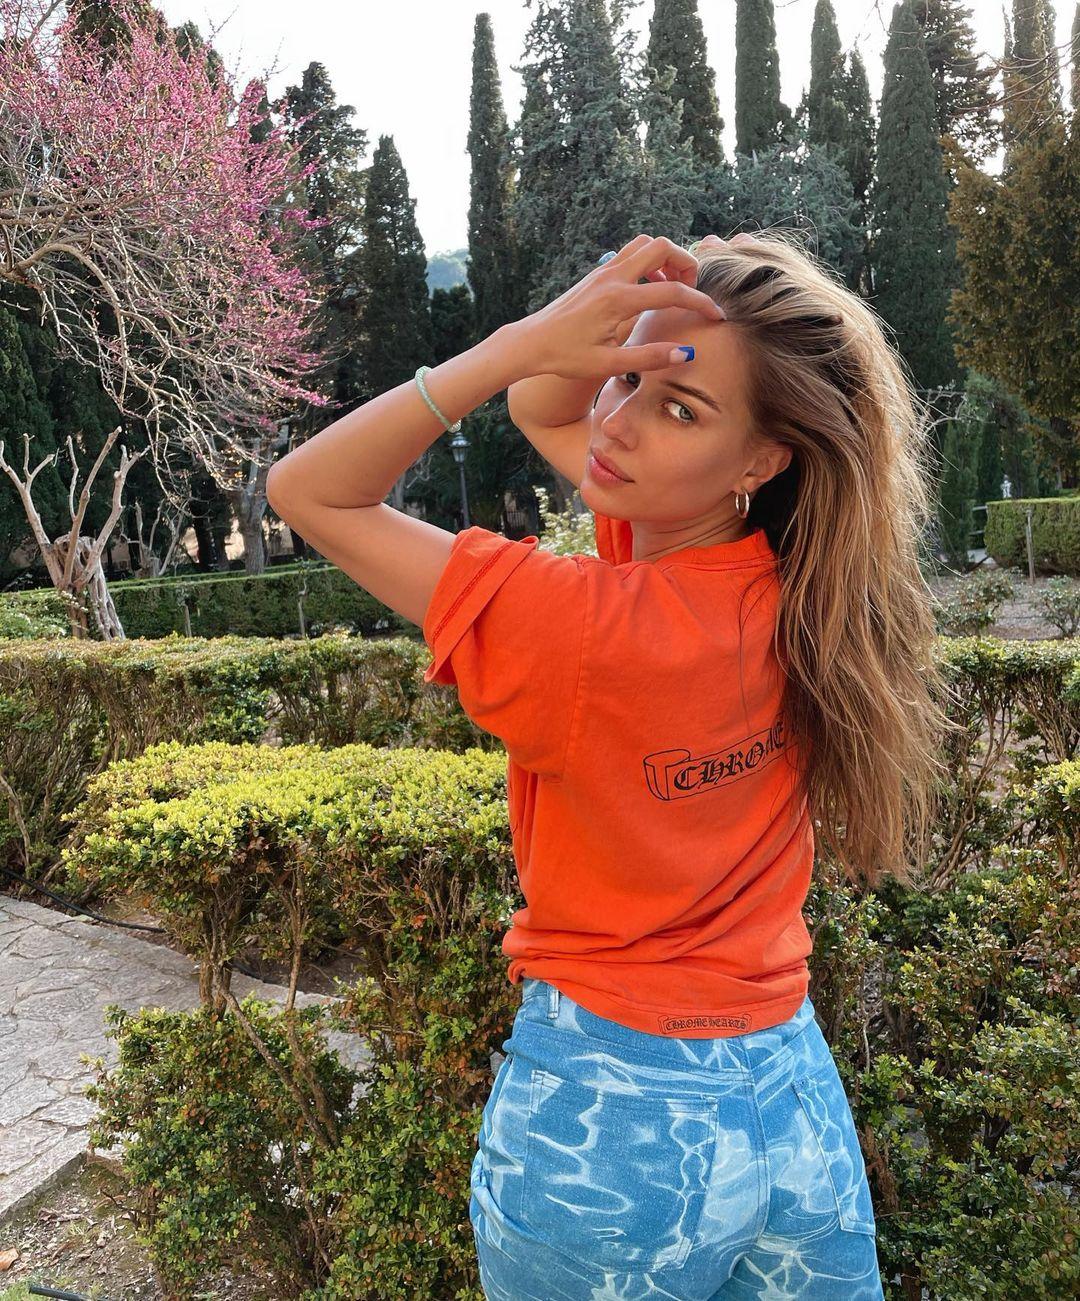 Nicole-Poturalski-Wallpapers-Insta-Fit-Bio-2